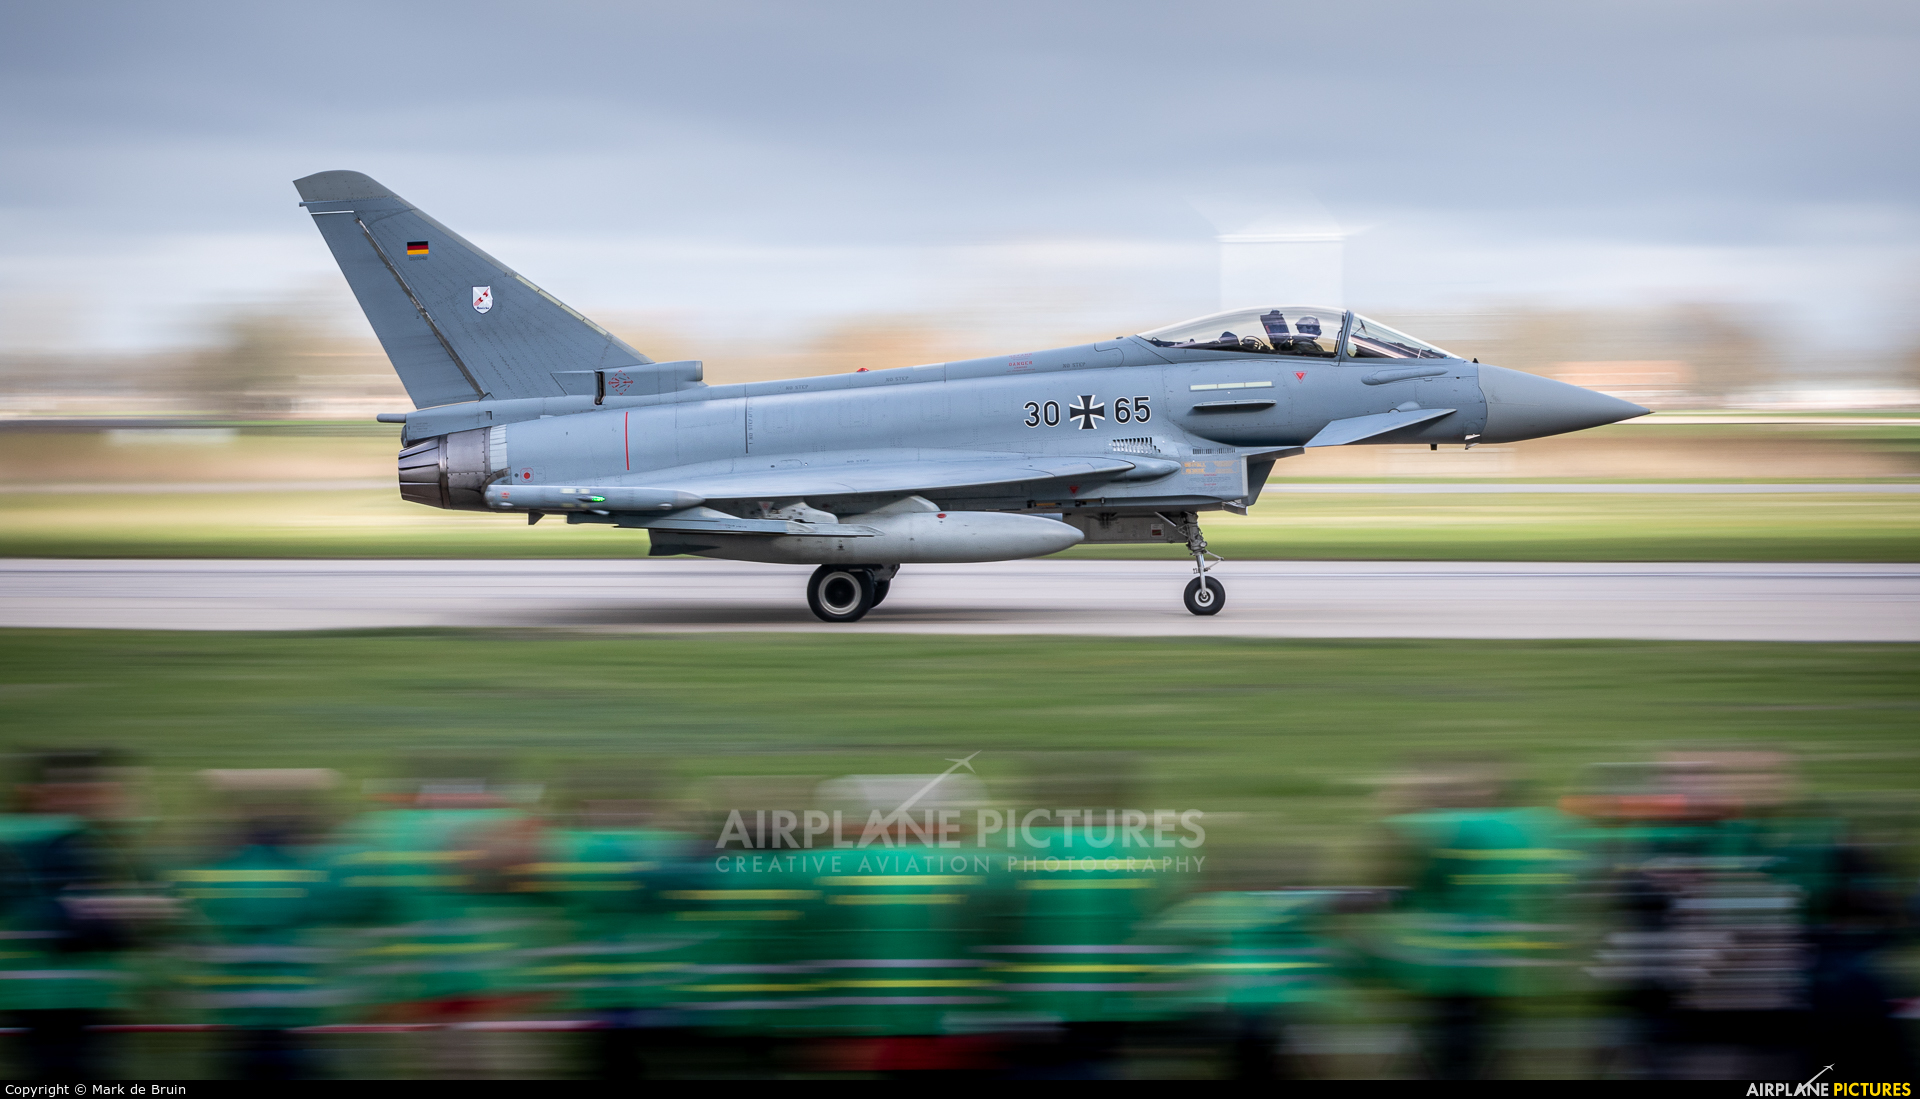 Germany - Air Force 30+65 aircraft at Leeuwarden